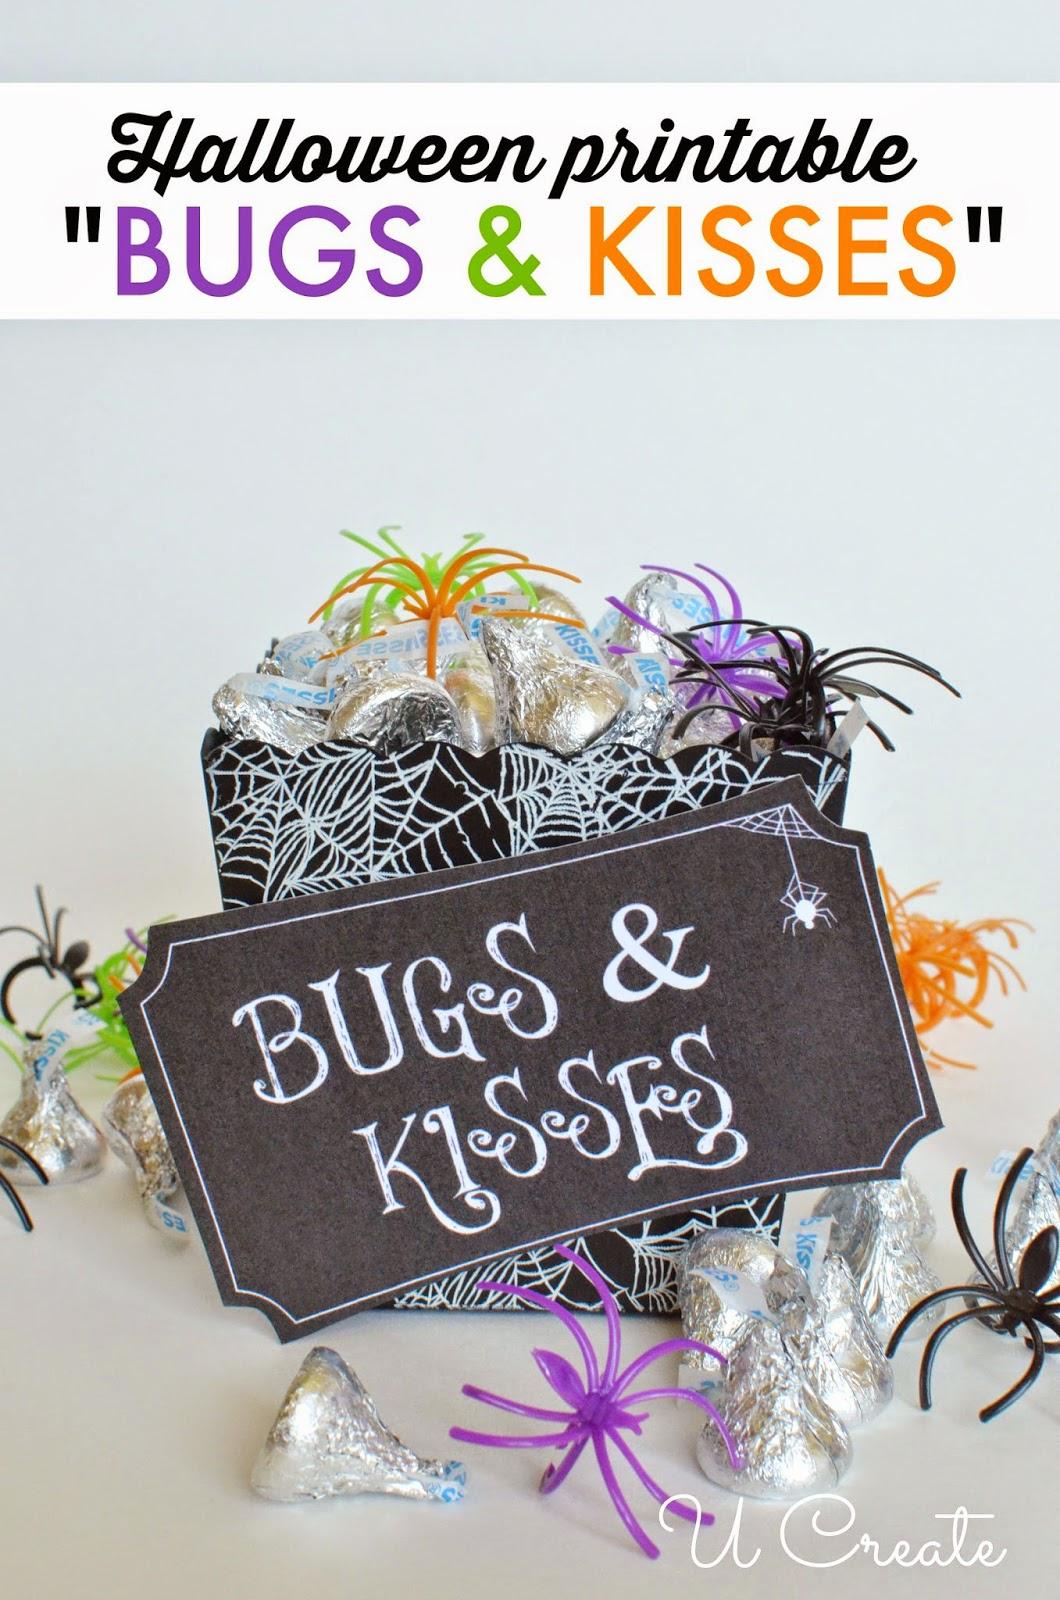 http://2.bp.blogspot.com/-vsDpmjyz0Ko/VAYYlCmjUHI/AAAAAAAAO1A/3ssvUeawE1Y/s1600/bugs-kisses-printable-tag.jpg